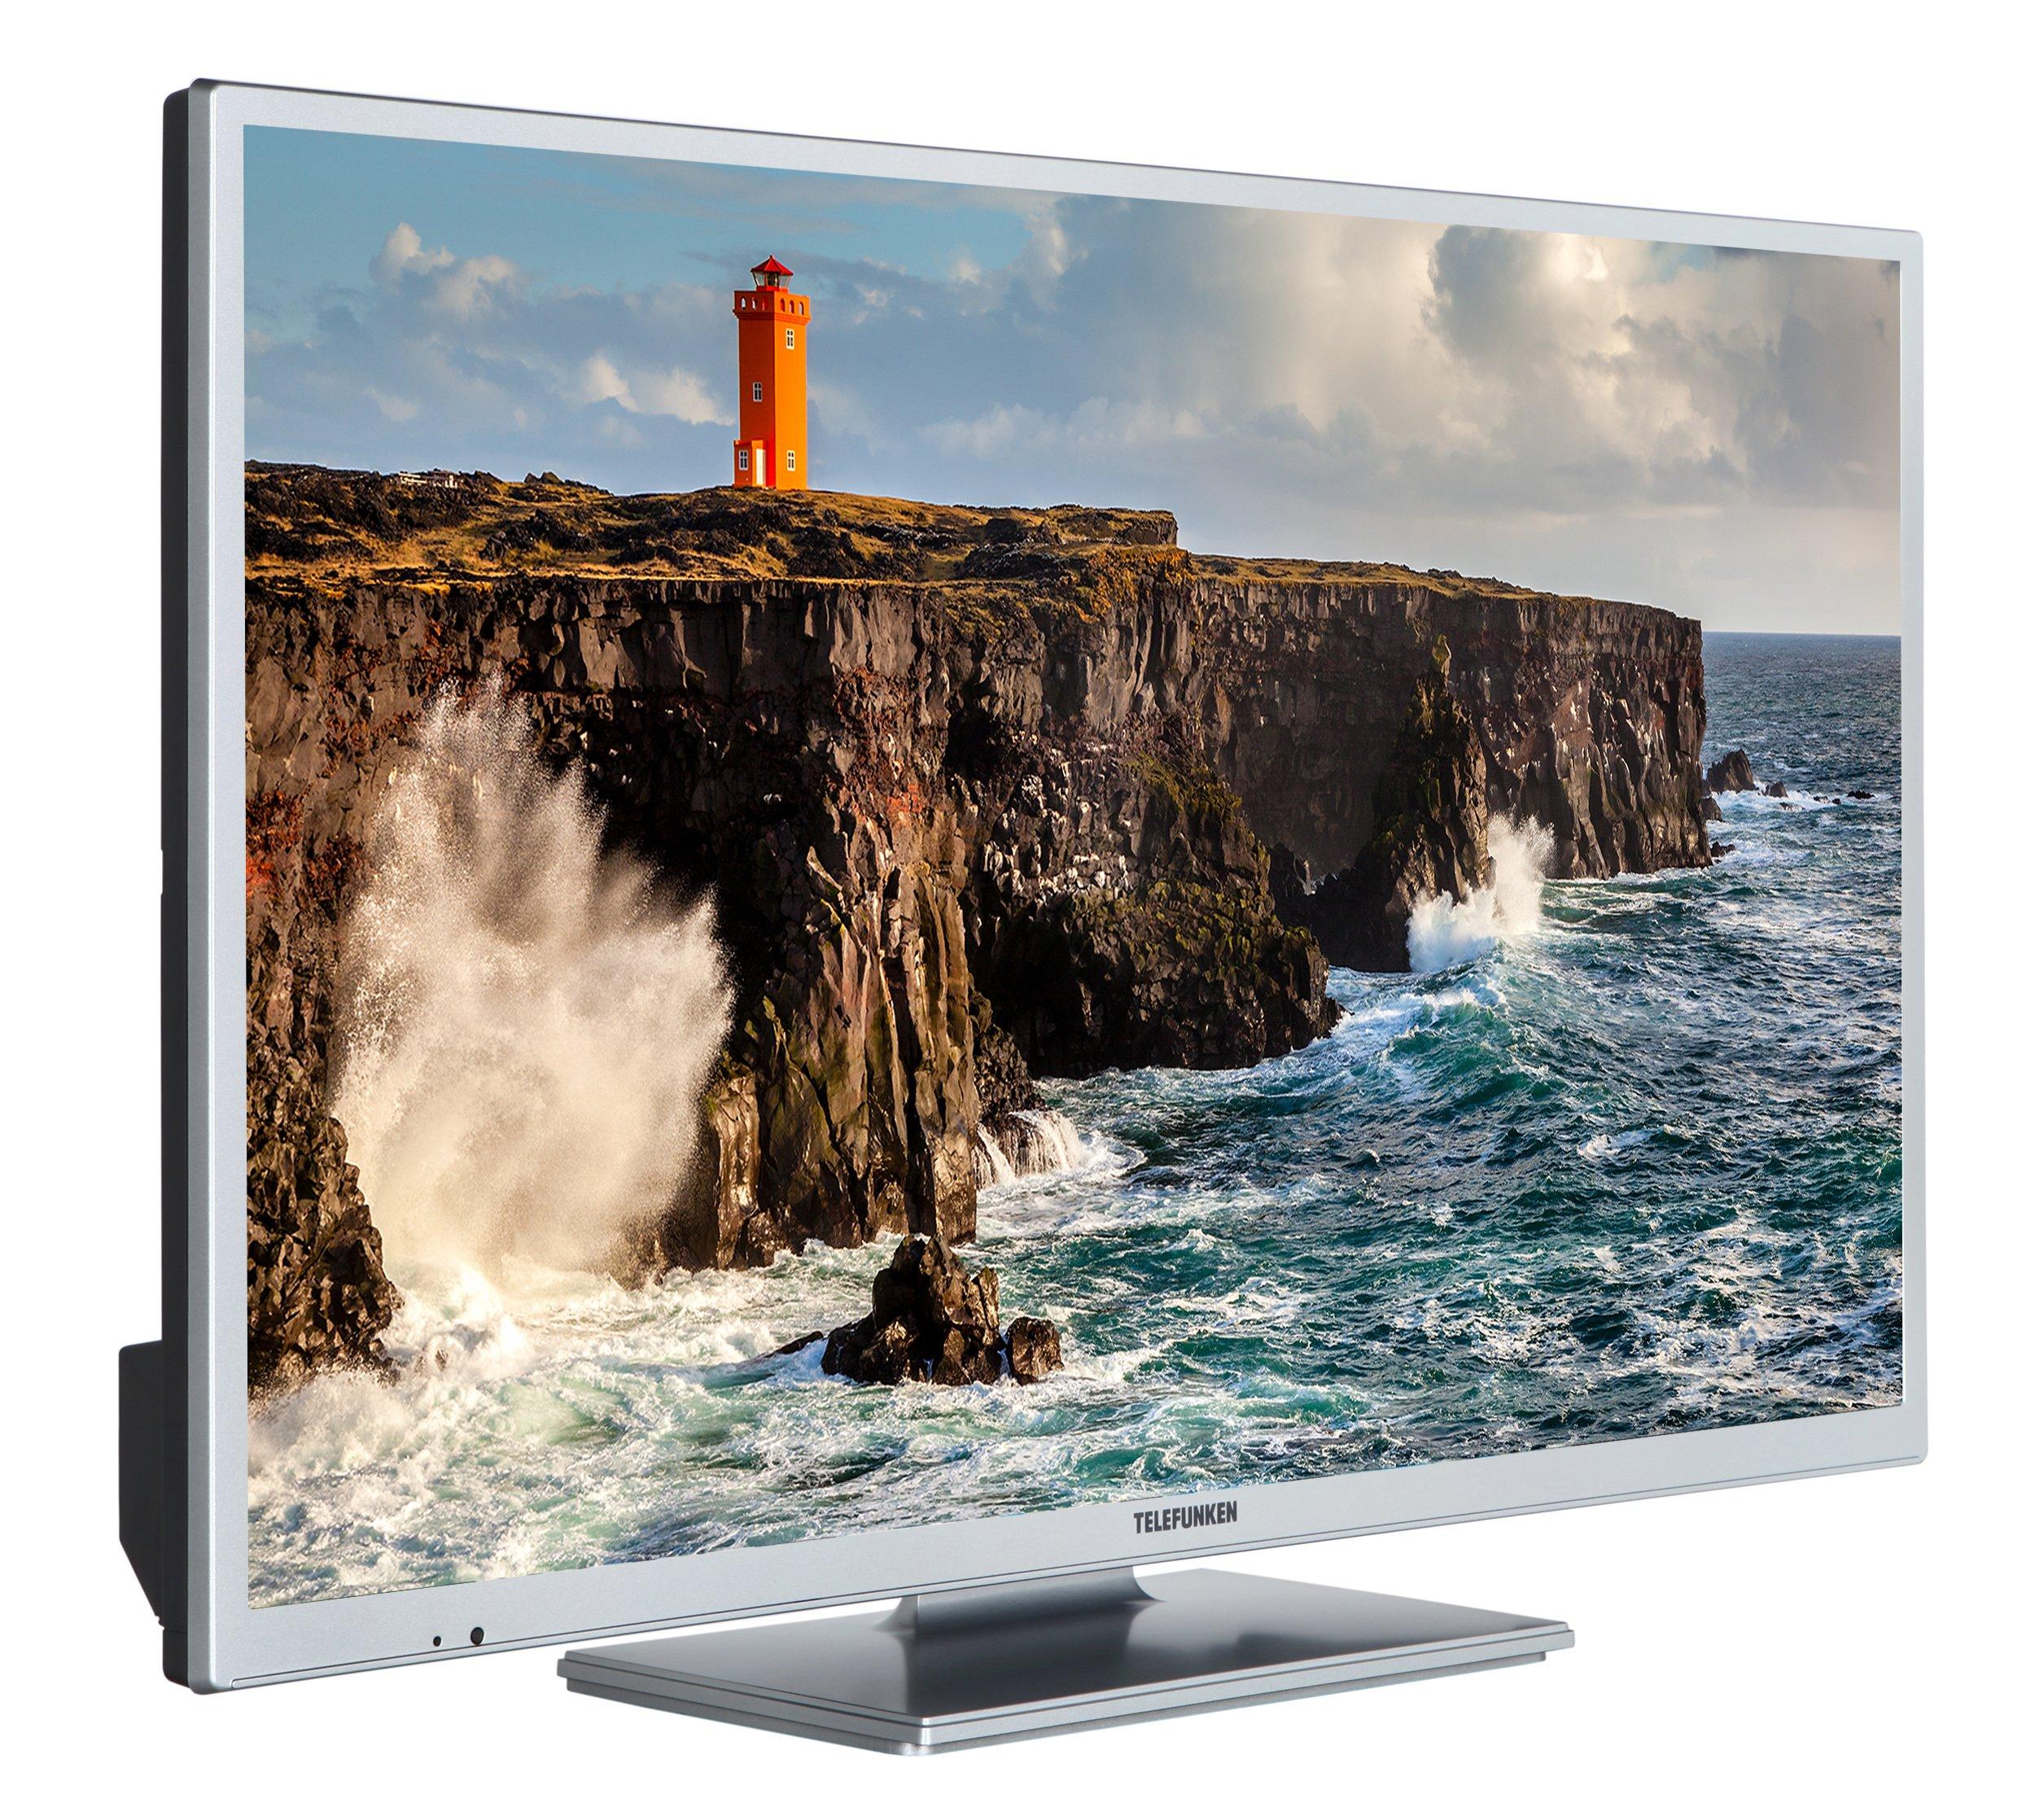 Telefunken XH D101D Televisor: Amazon.es: Electrónica